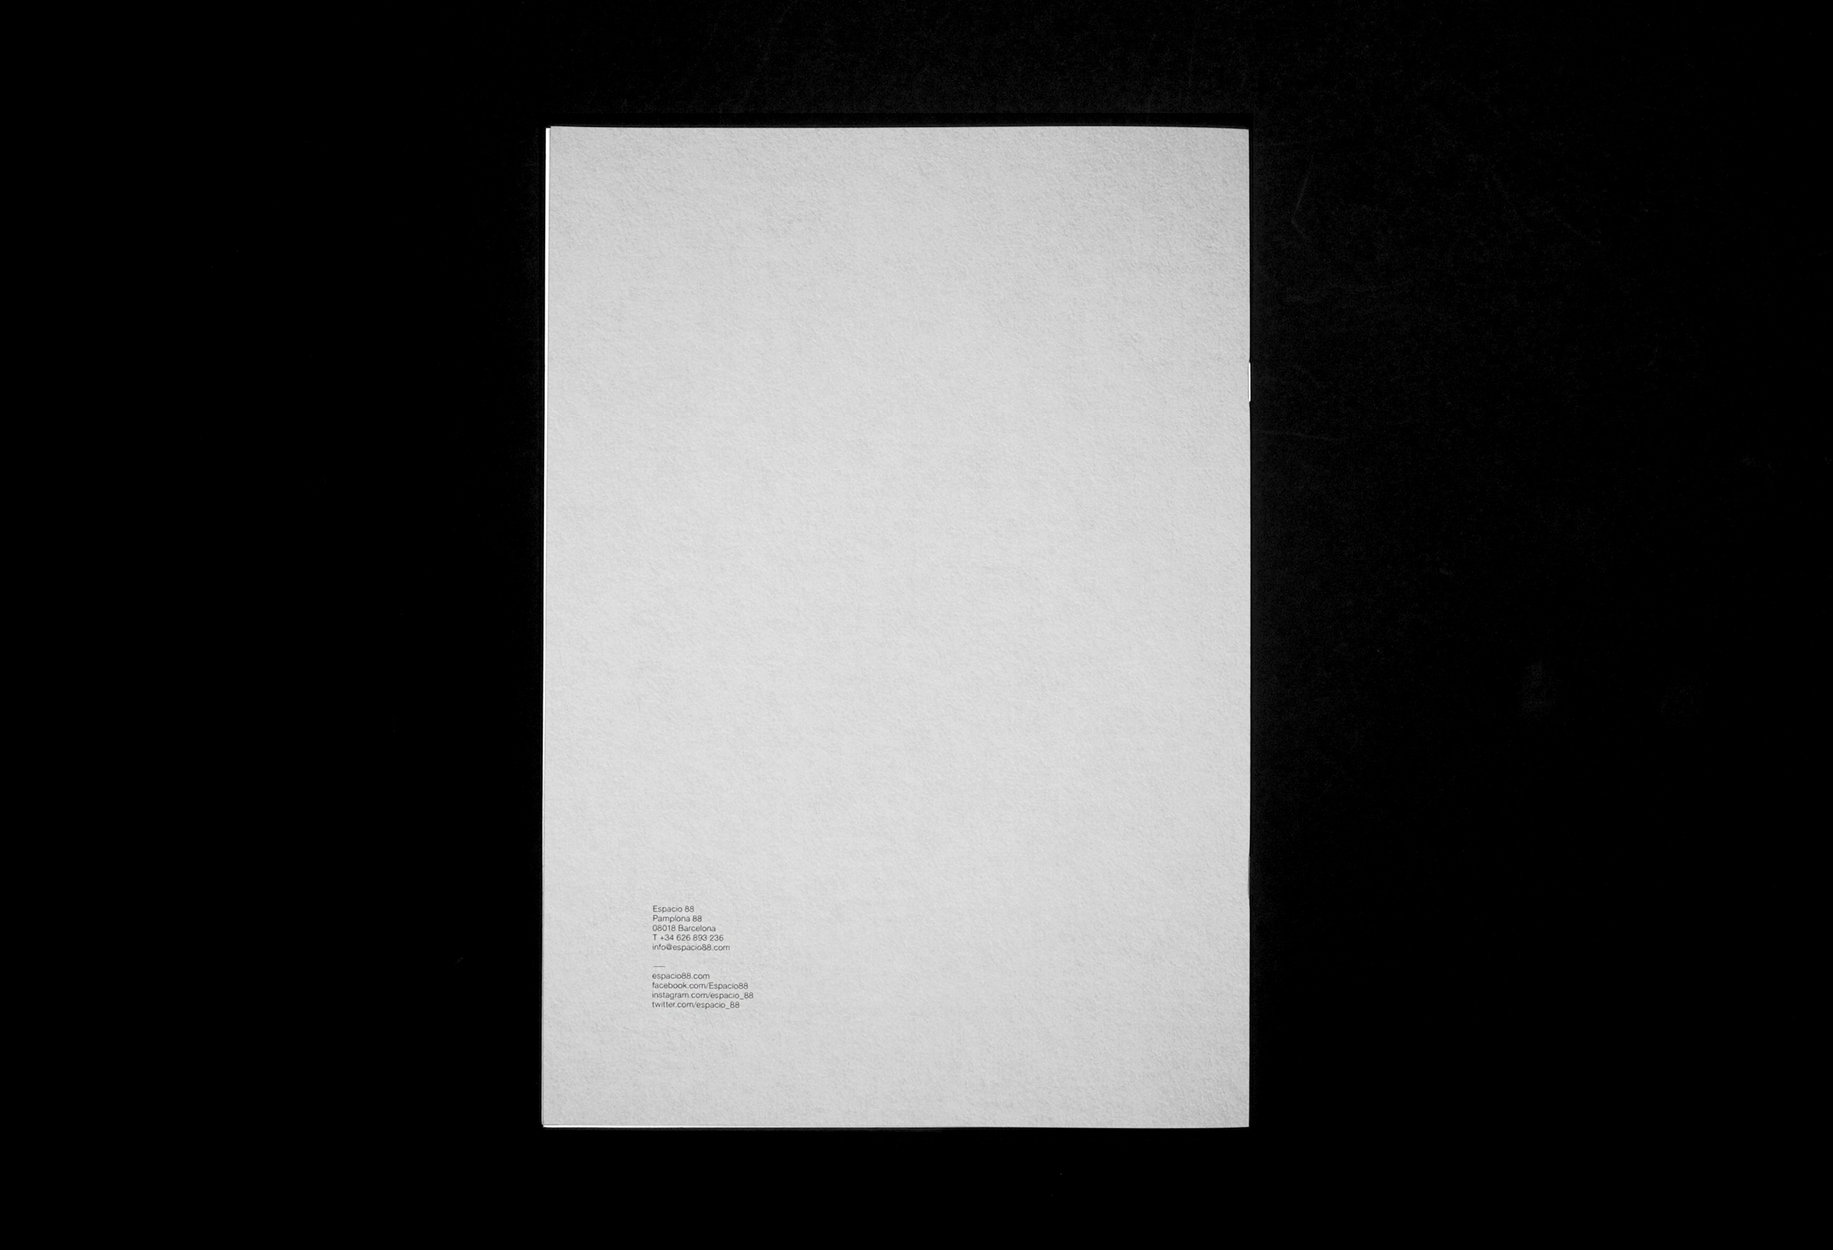 espacio-88-dossier-4.jpg